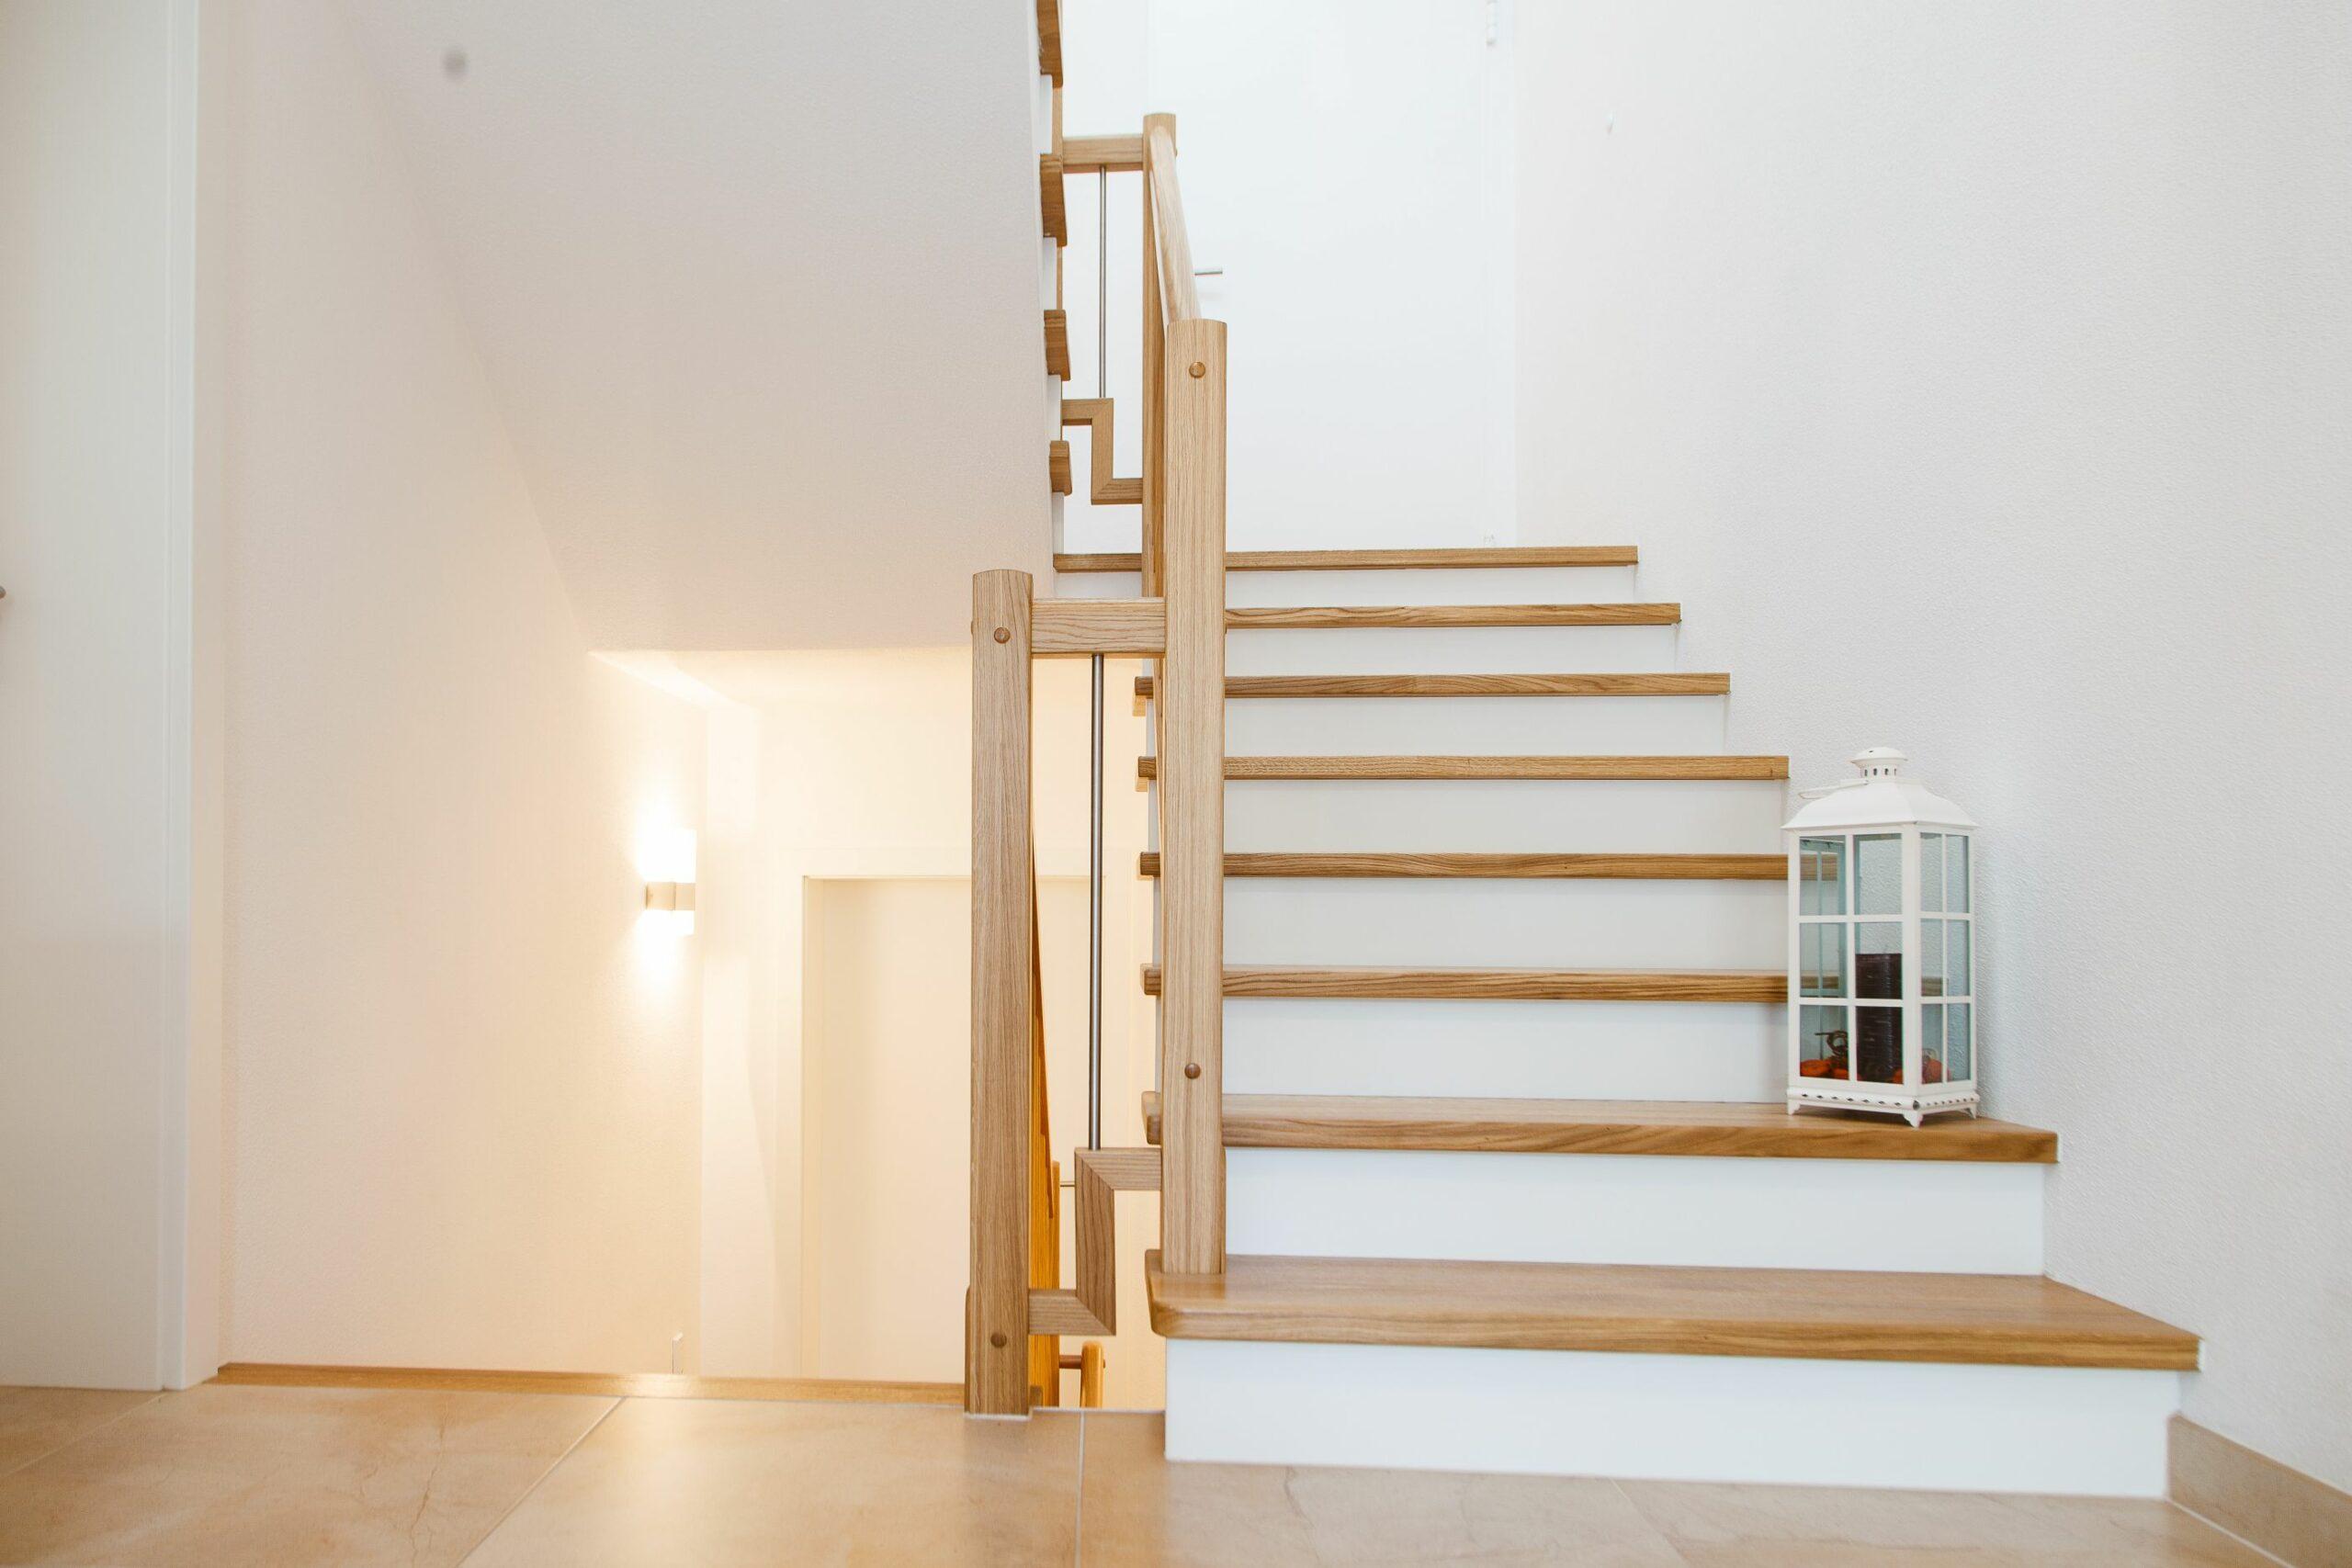 Treppe mit Holz verkleidet